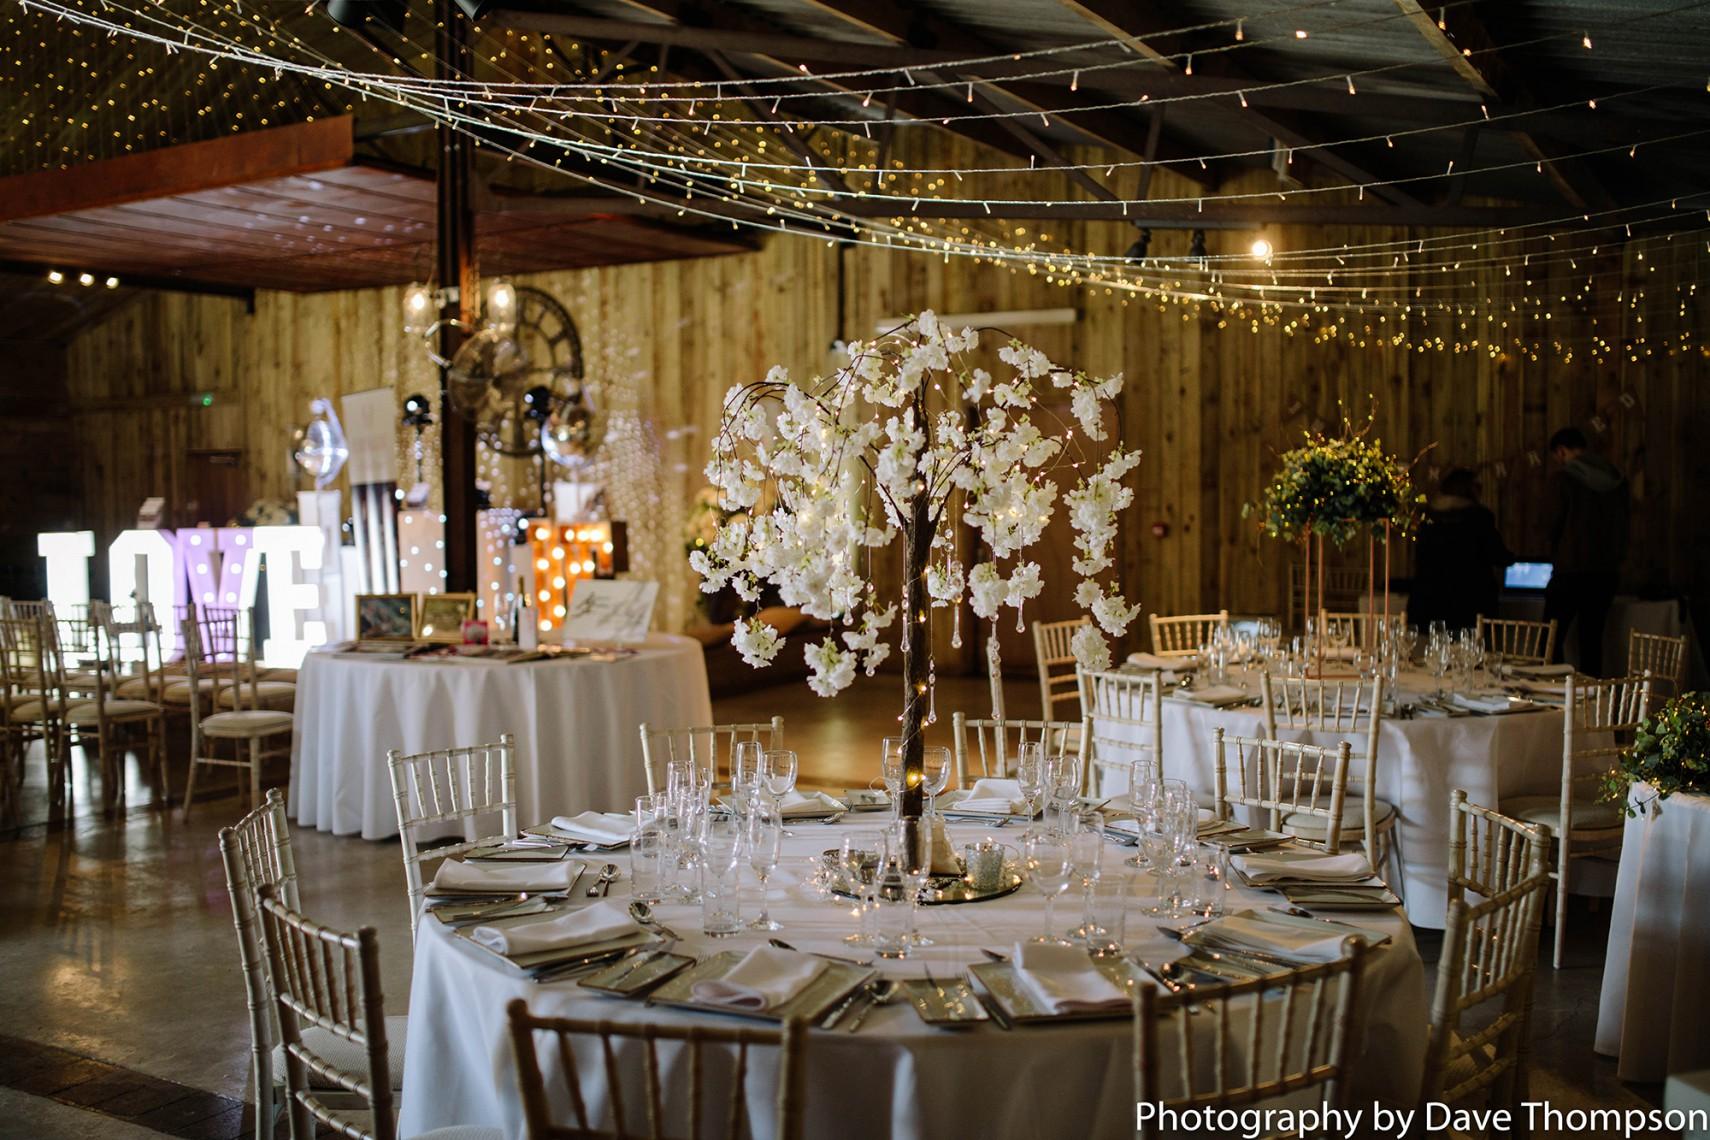 Tables dressed for a wedding at Alcumlow Wedding Barn